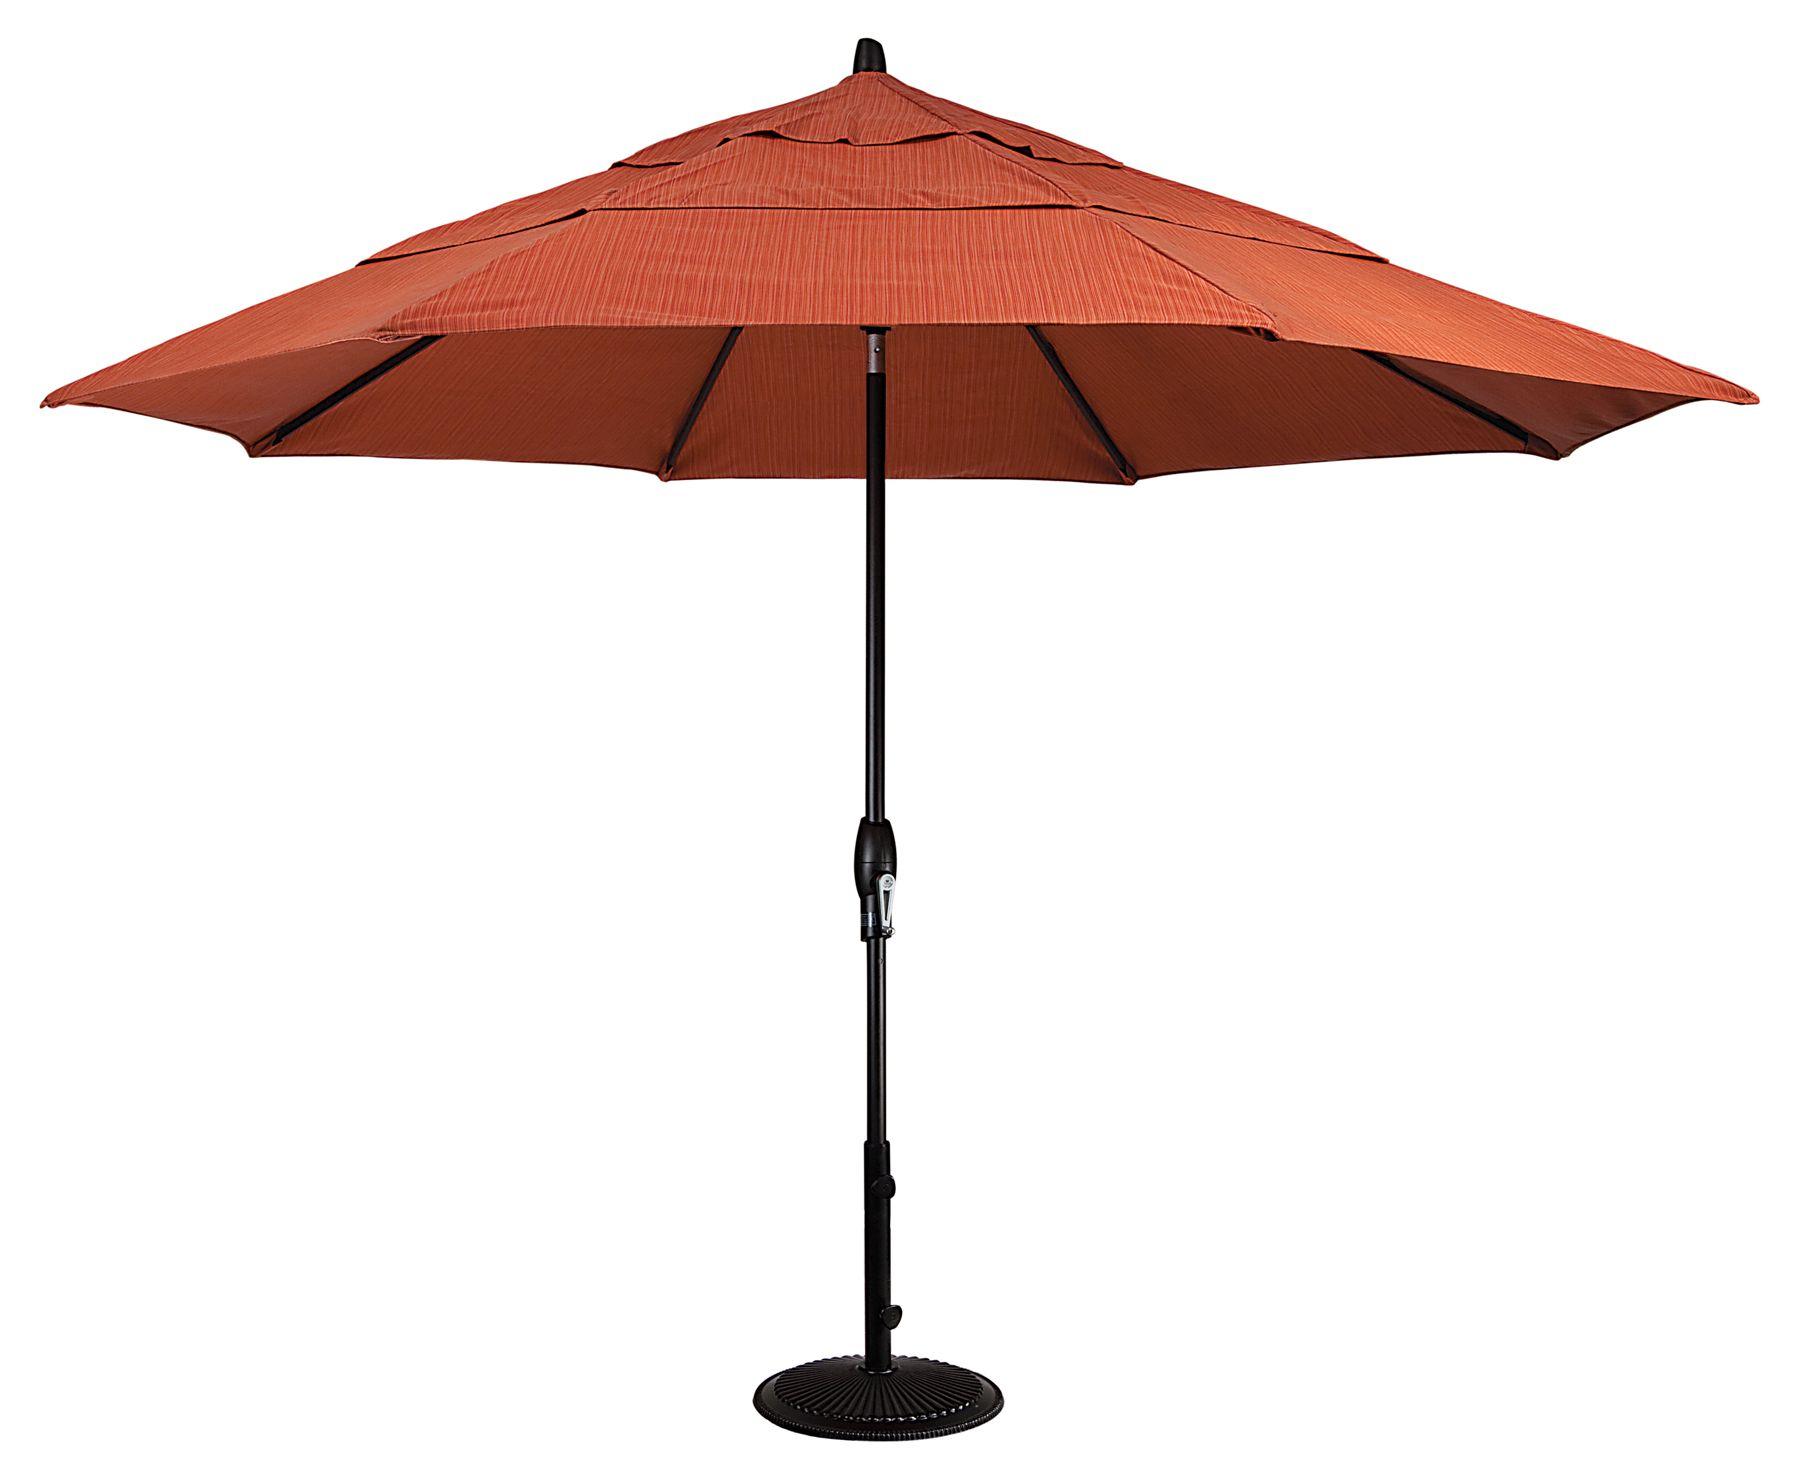 UM8129 11u0027 Auto Tilt Umbrella By Treasure Garden